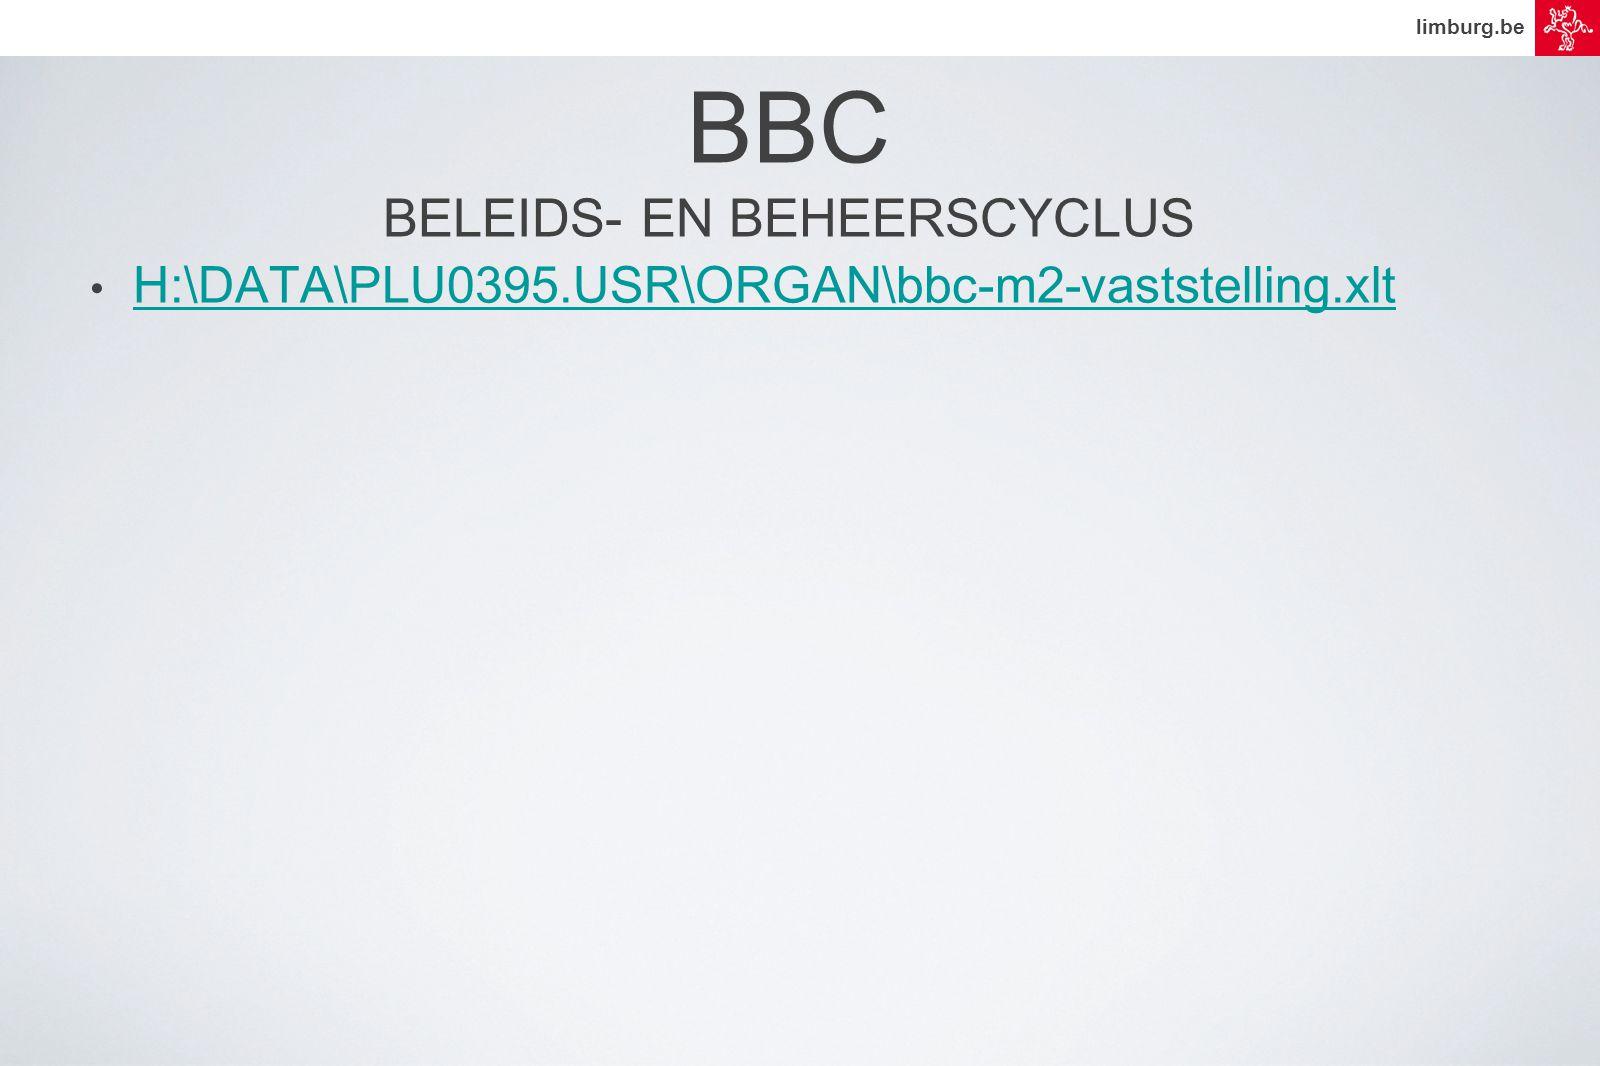 limburg.be BBC BELEIDS- EN BEHEERSCYCLUS • H:\DATA\PLU0395.USR\ORGAN\bbc-m2-vaststelling.xlt H:\DATA\PLU0395.USR\ORGAN\bbc-m2-vaststelling.xlt